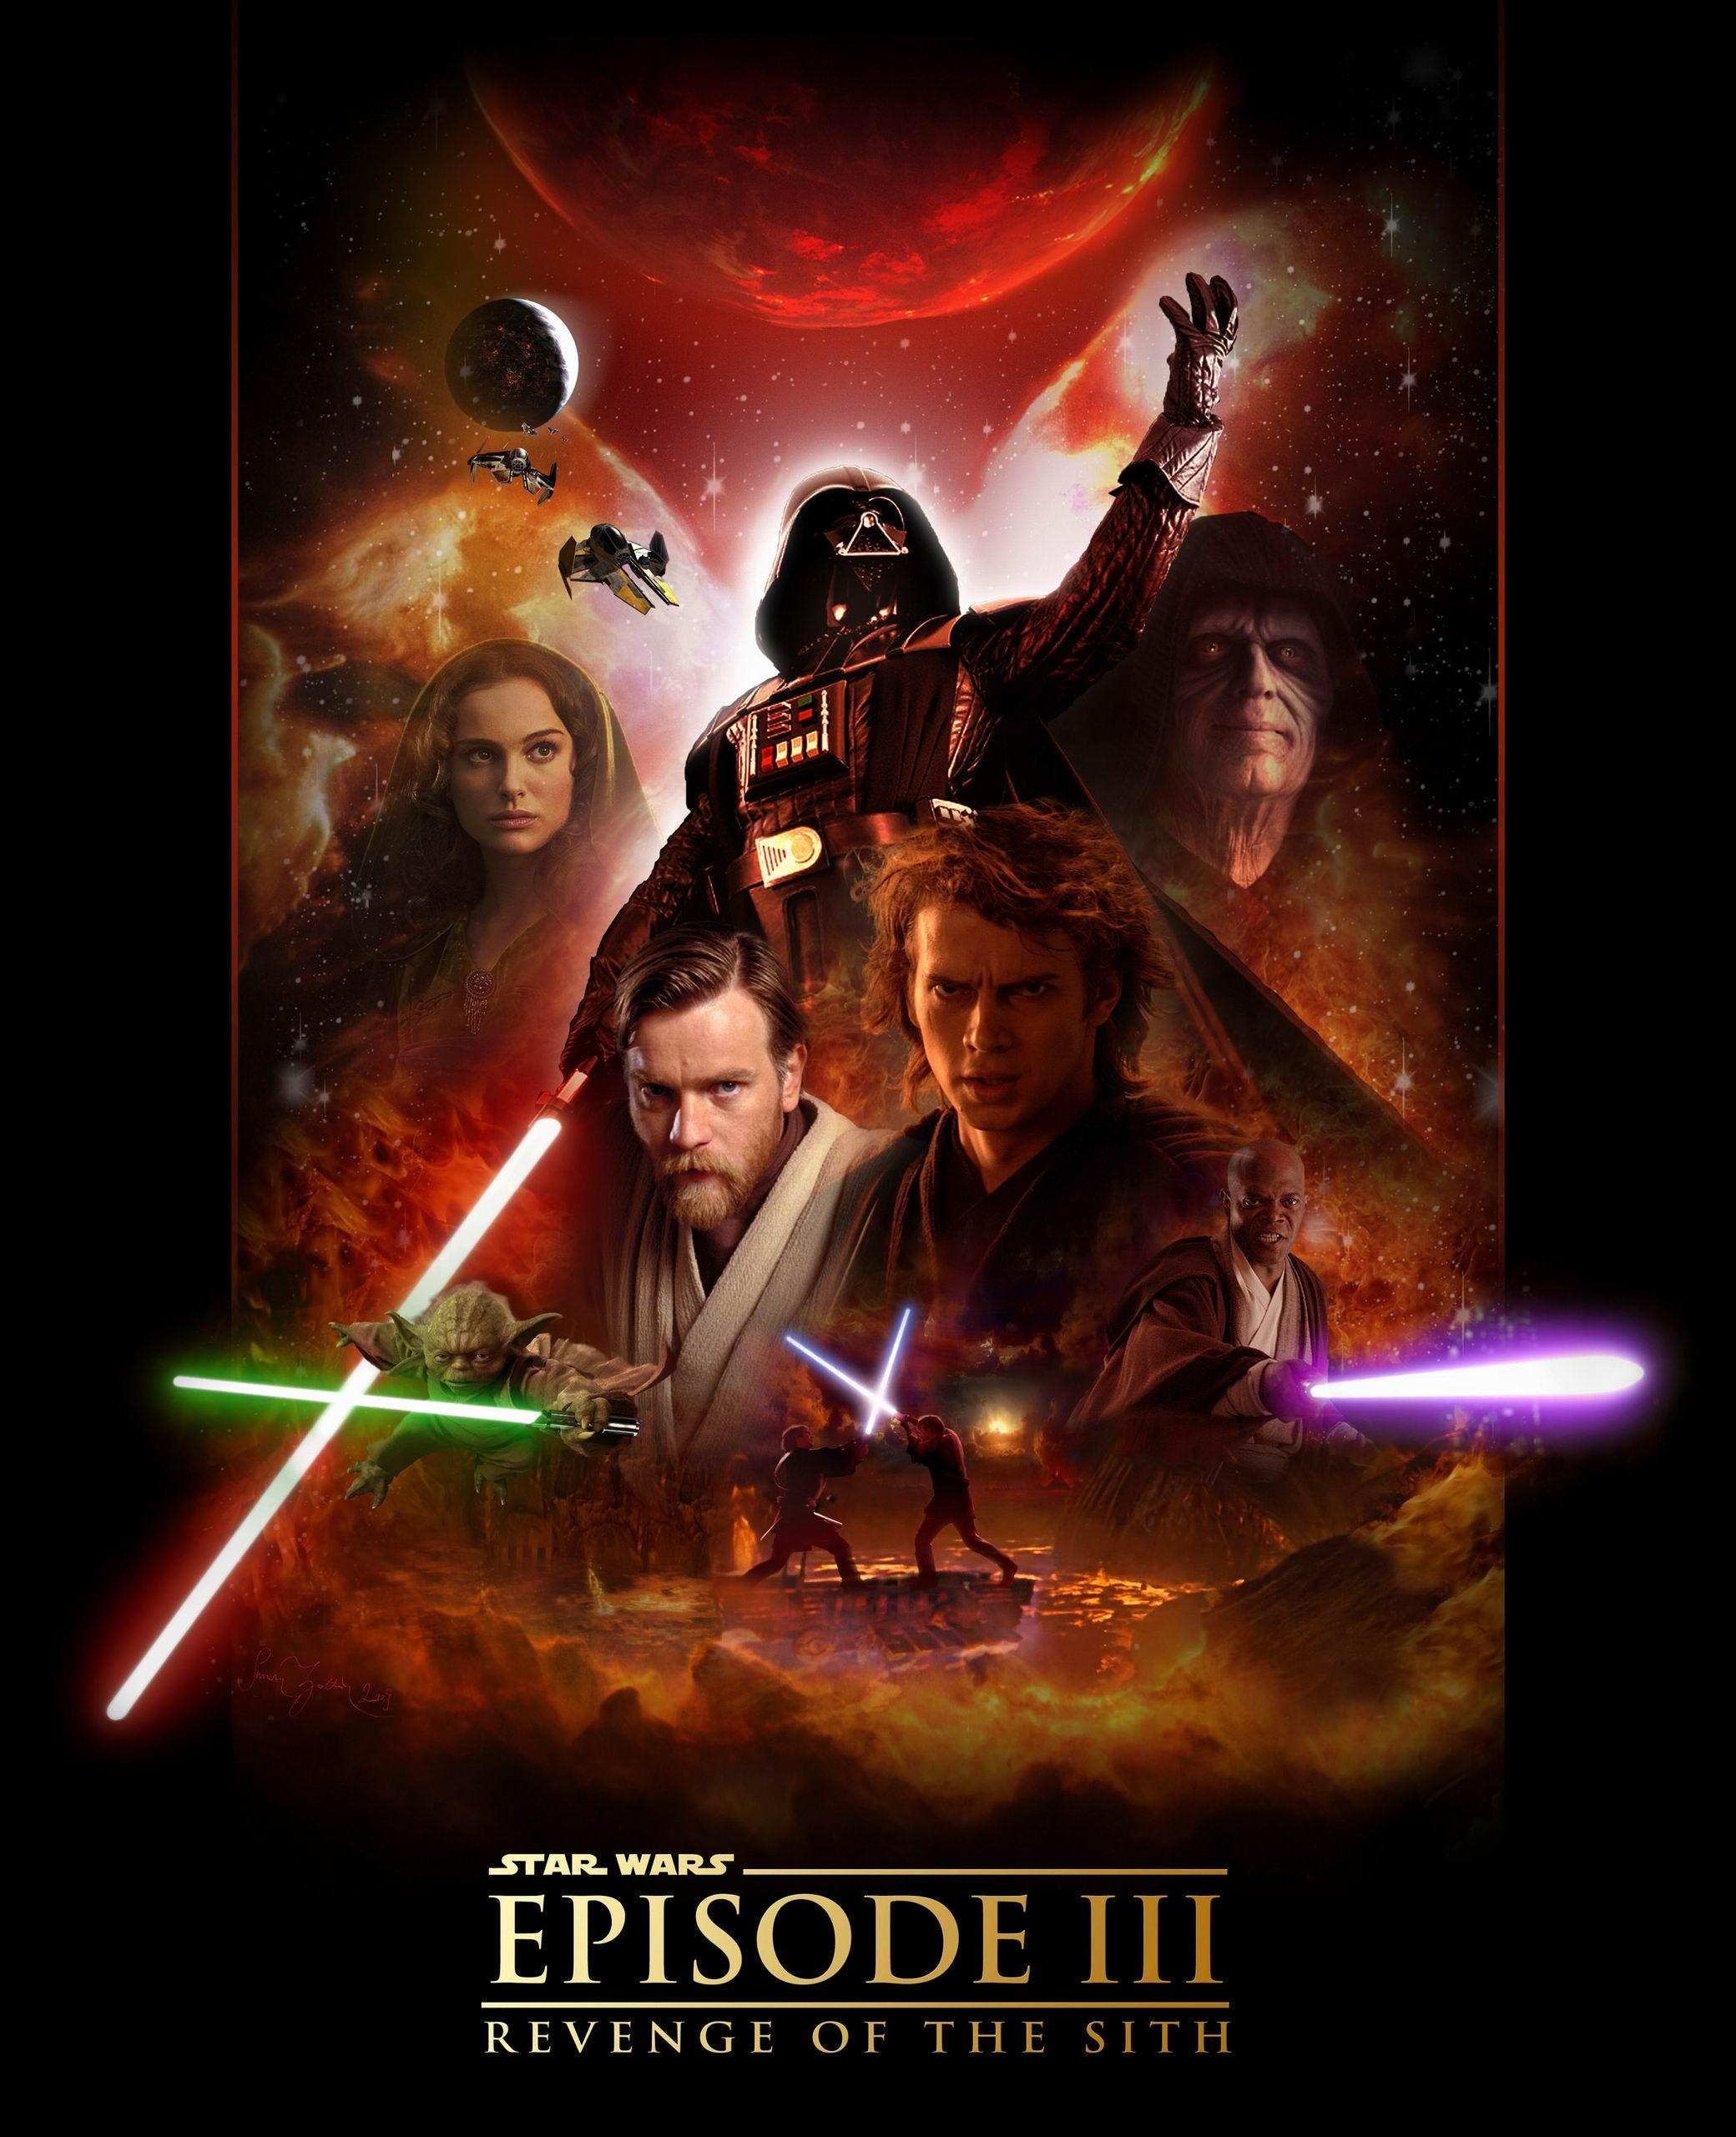 STAR WARS EPISODE III REVENGE OF THE SITH 2080x2560